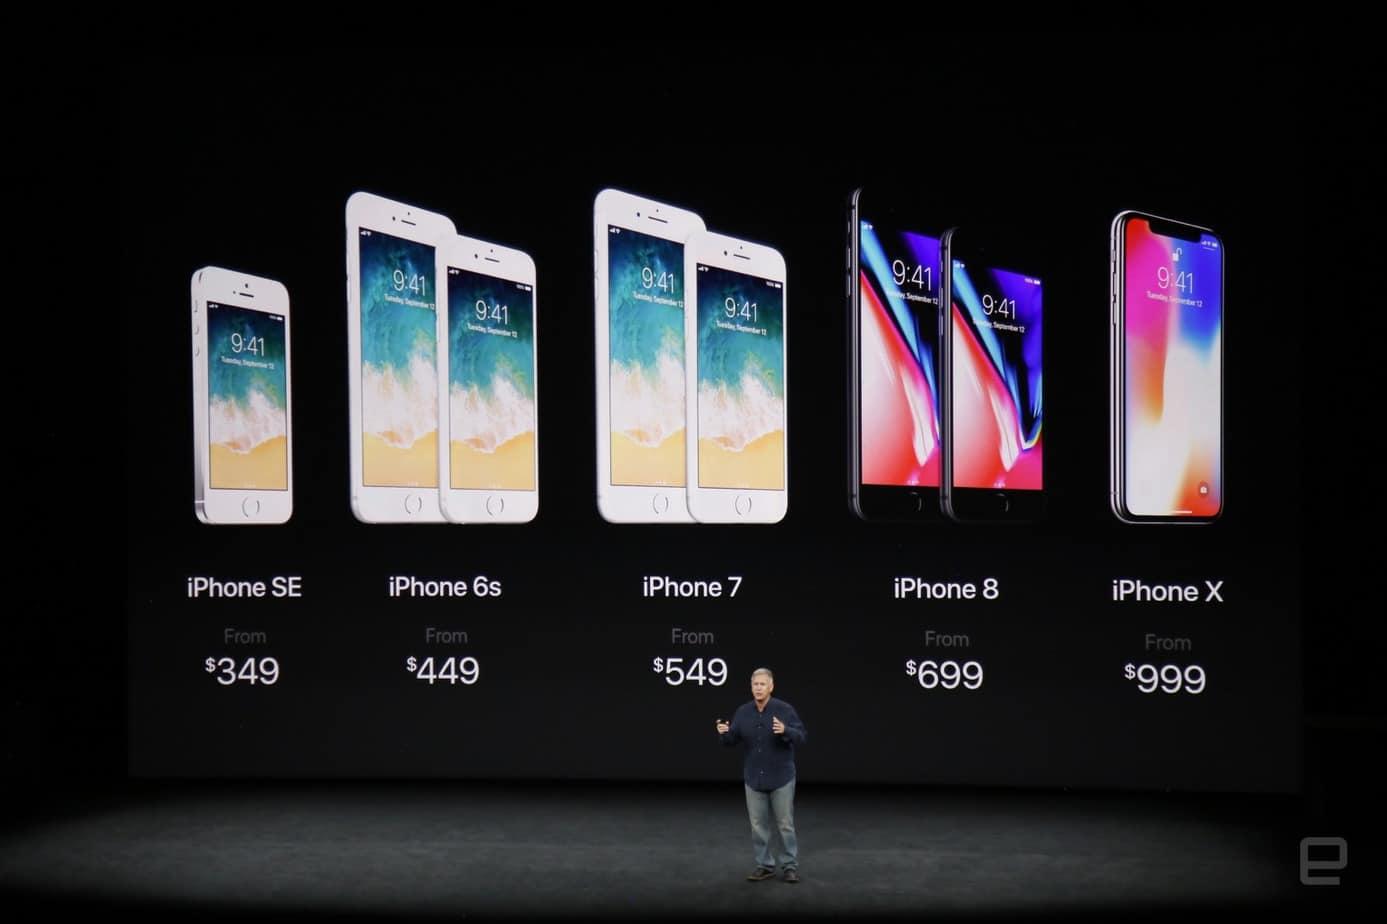 apple event - iPhone x